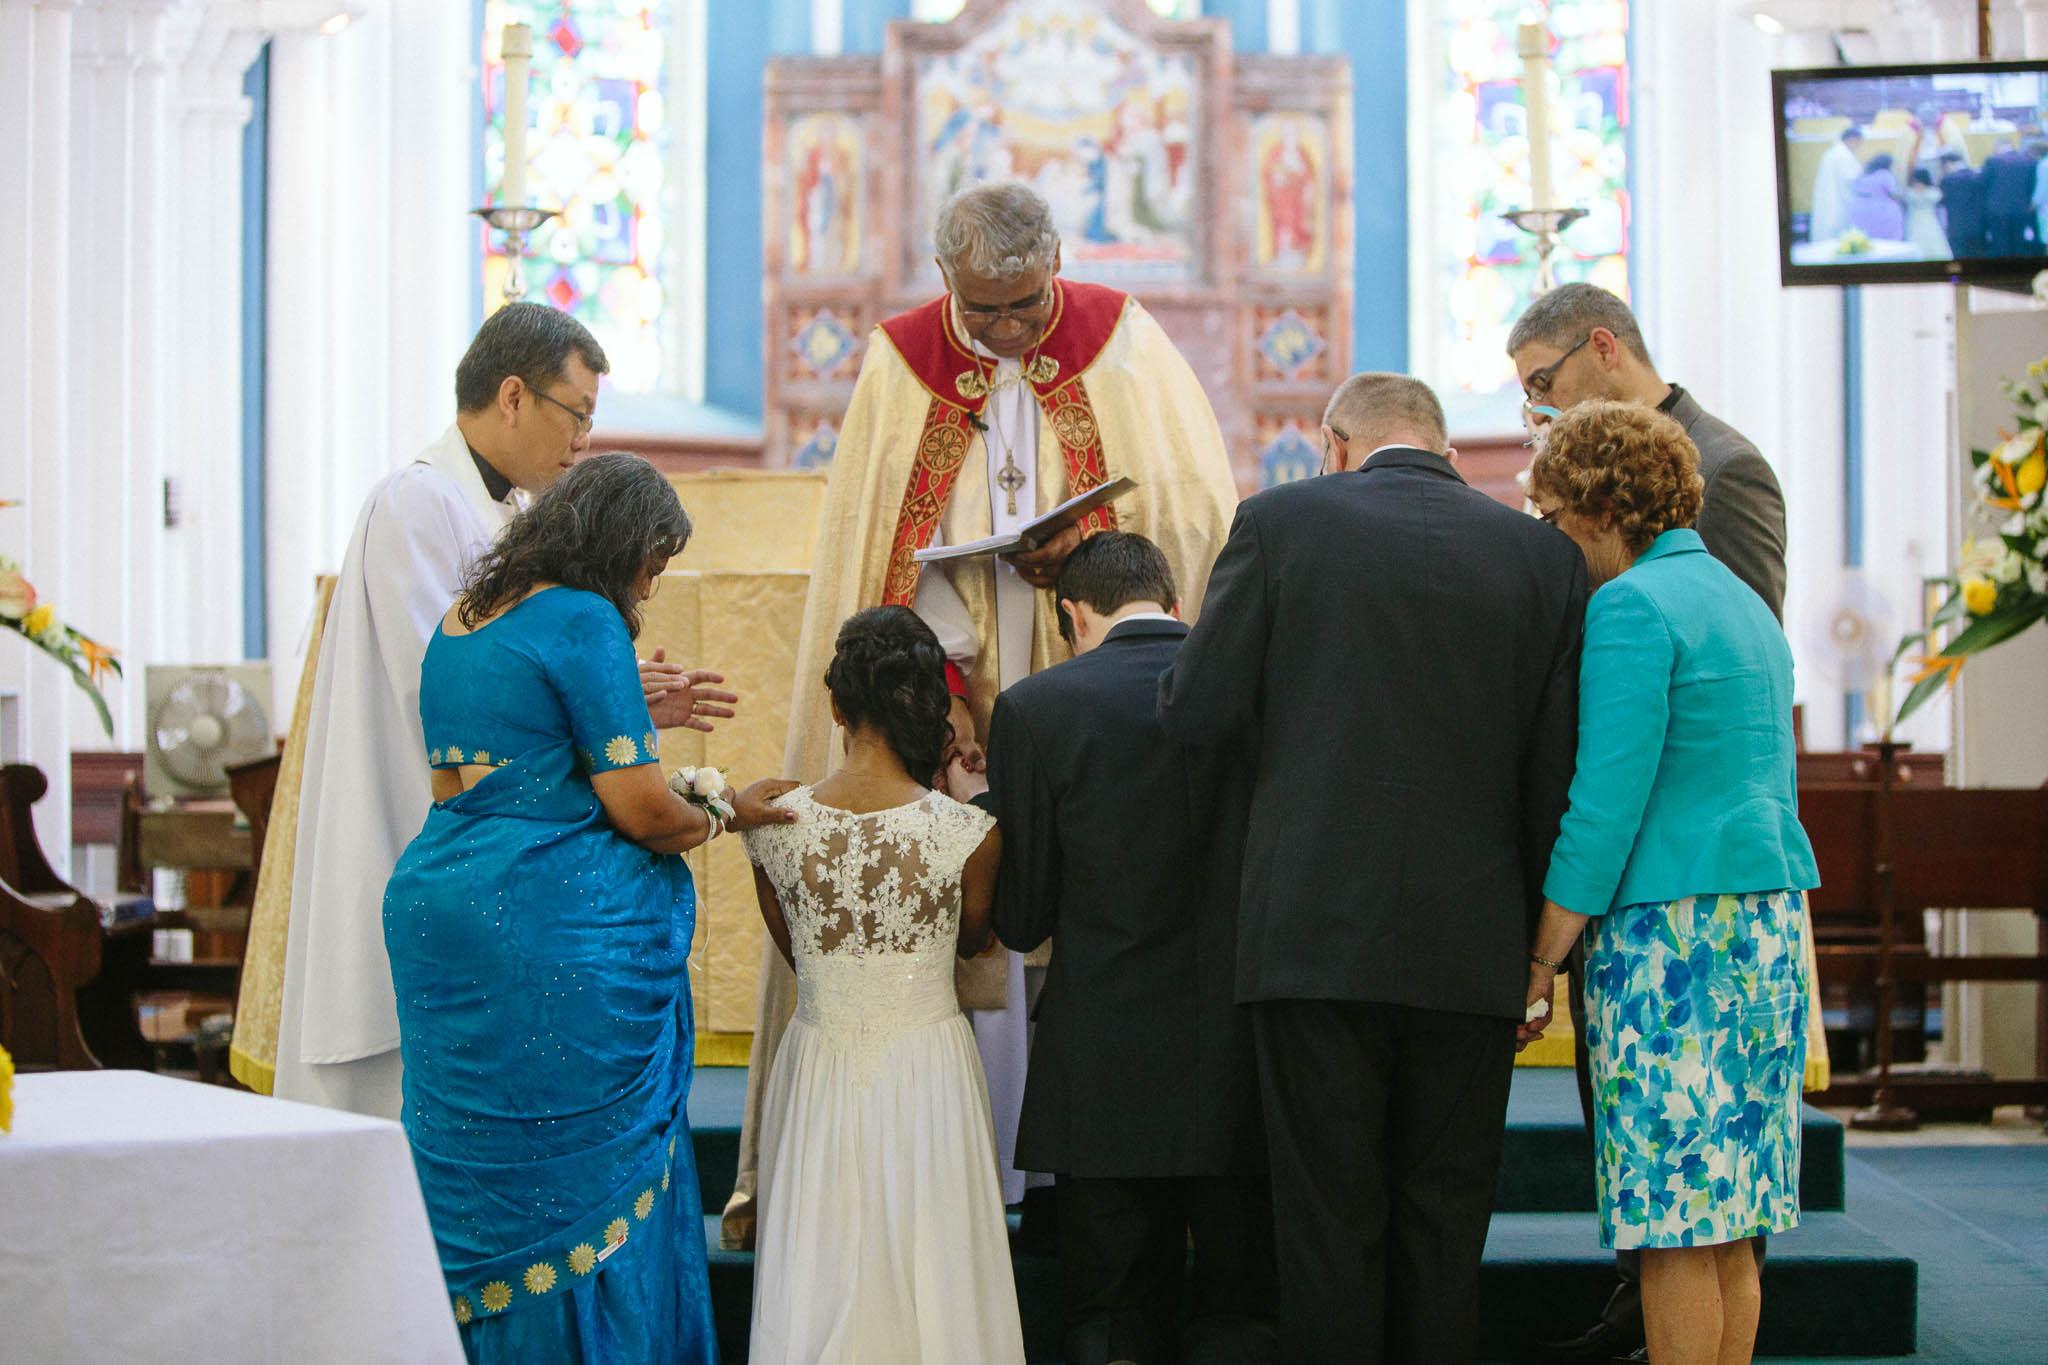 singapore-wedding-photographer-st-andrews-cathedral-renita-david-22.jpg